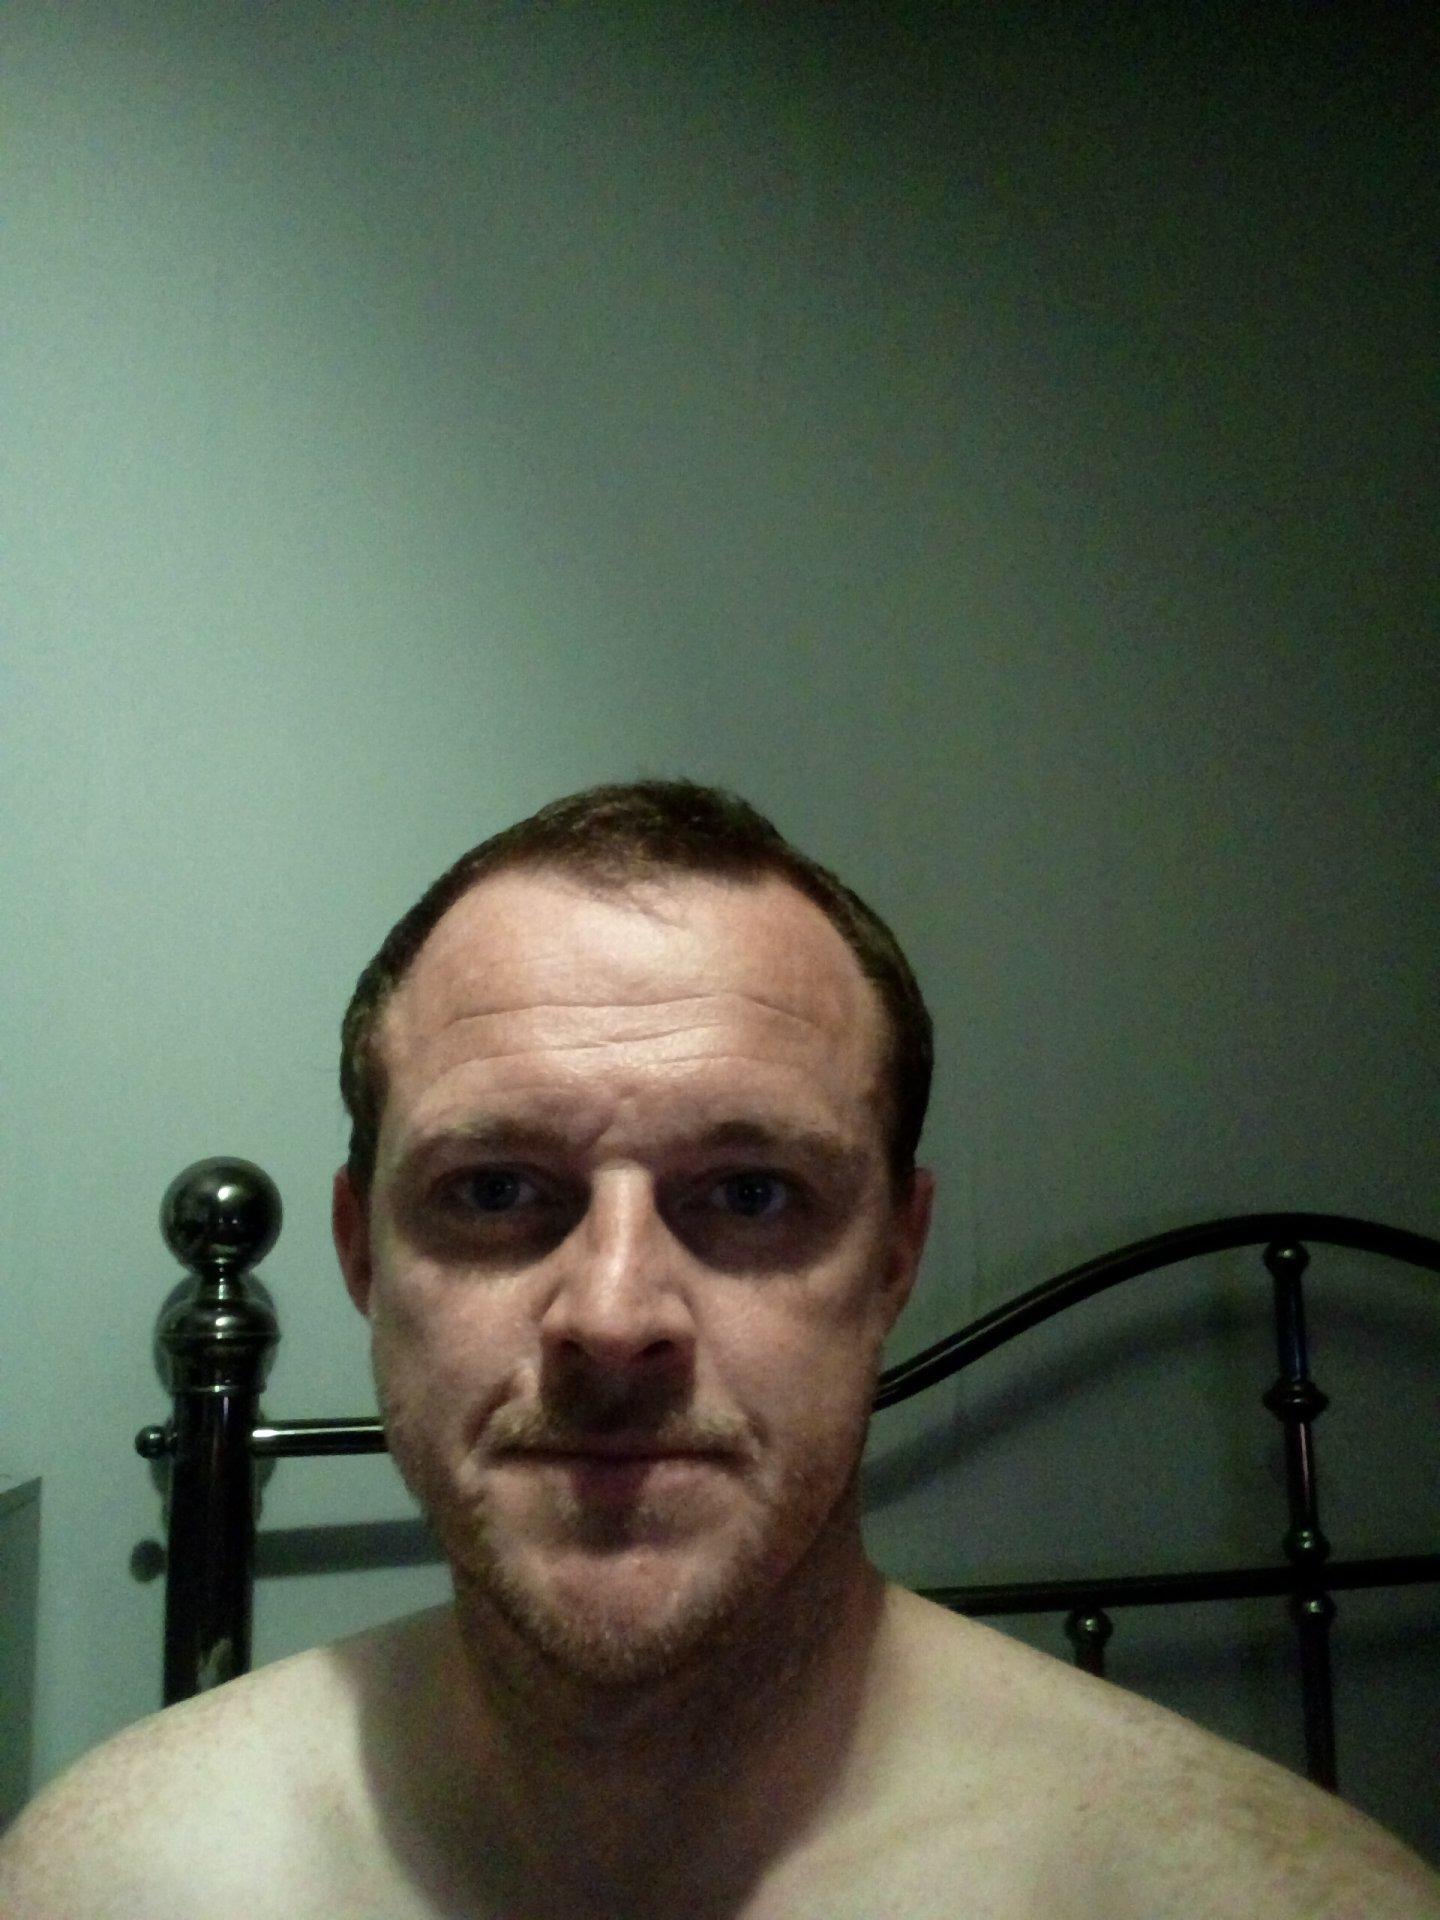 Hereforfun from Fife,United Kingdom